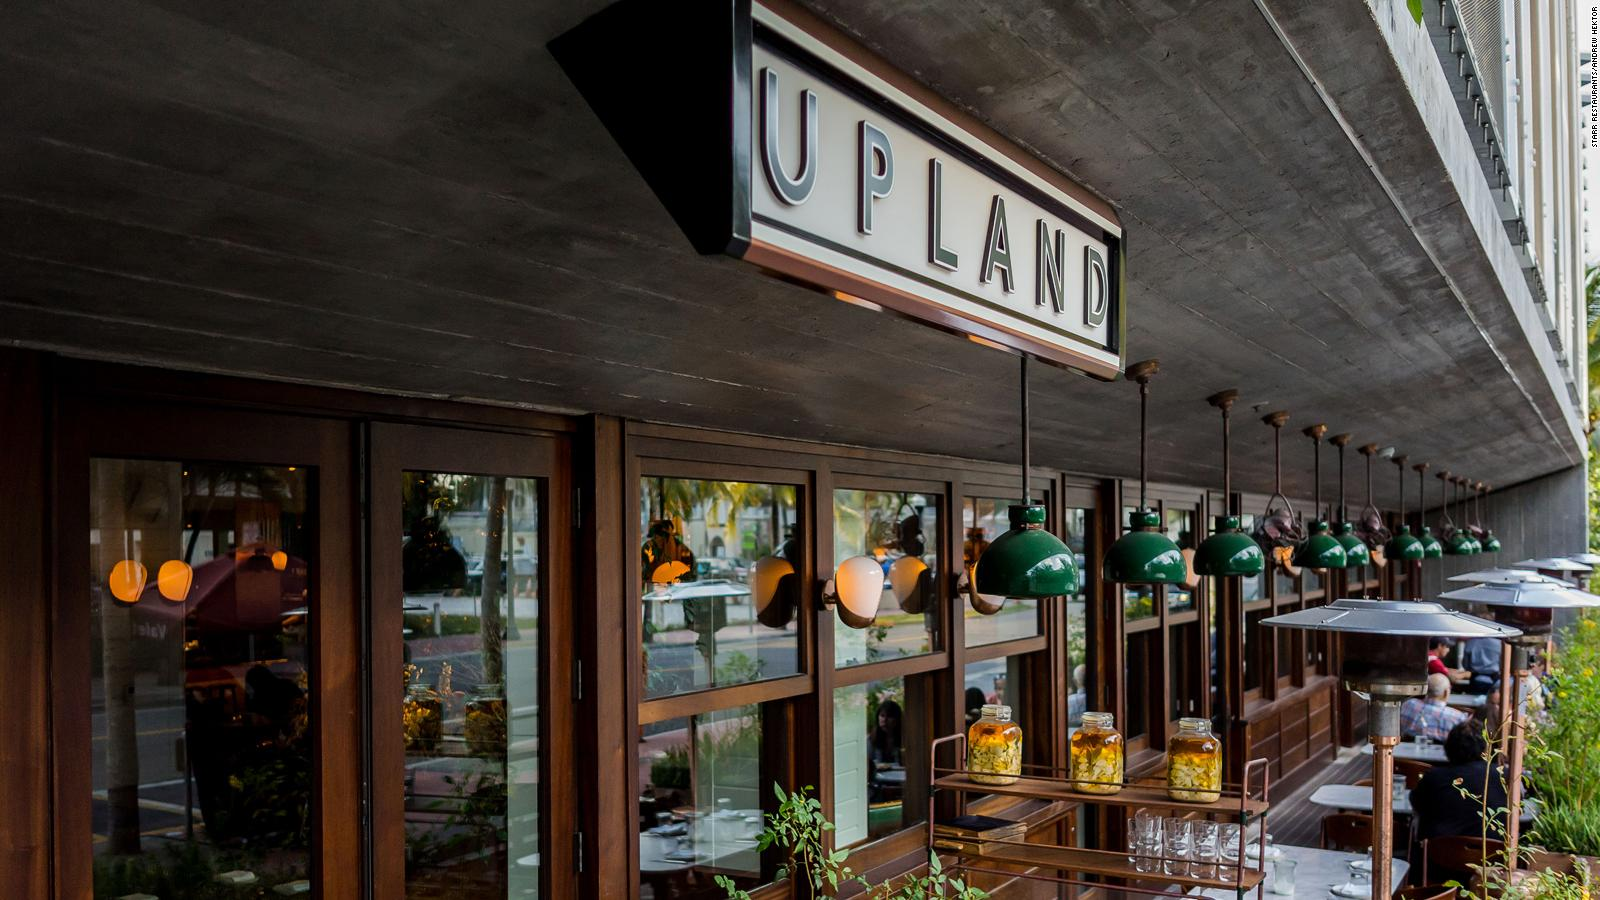 Miami S Best Restaurants According To Lti Cnn Travel